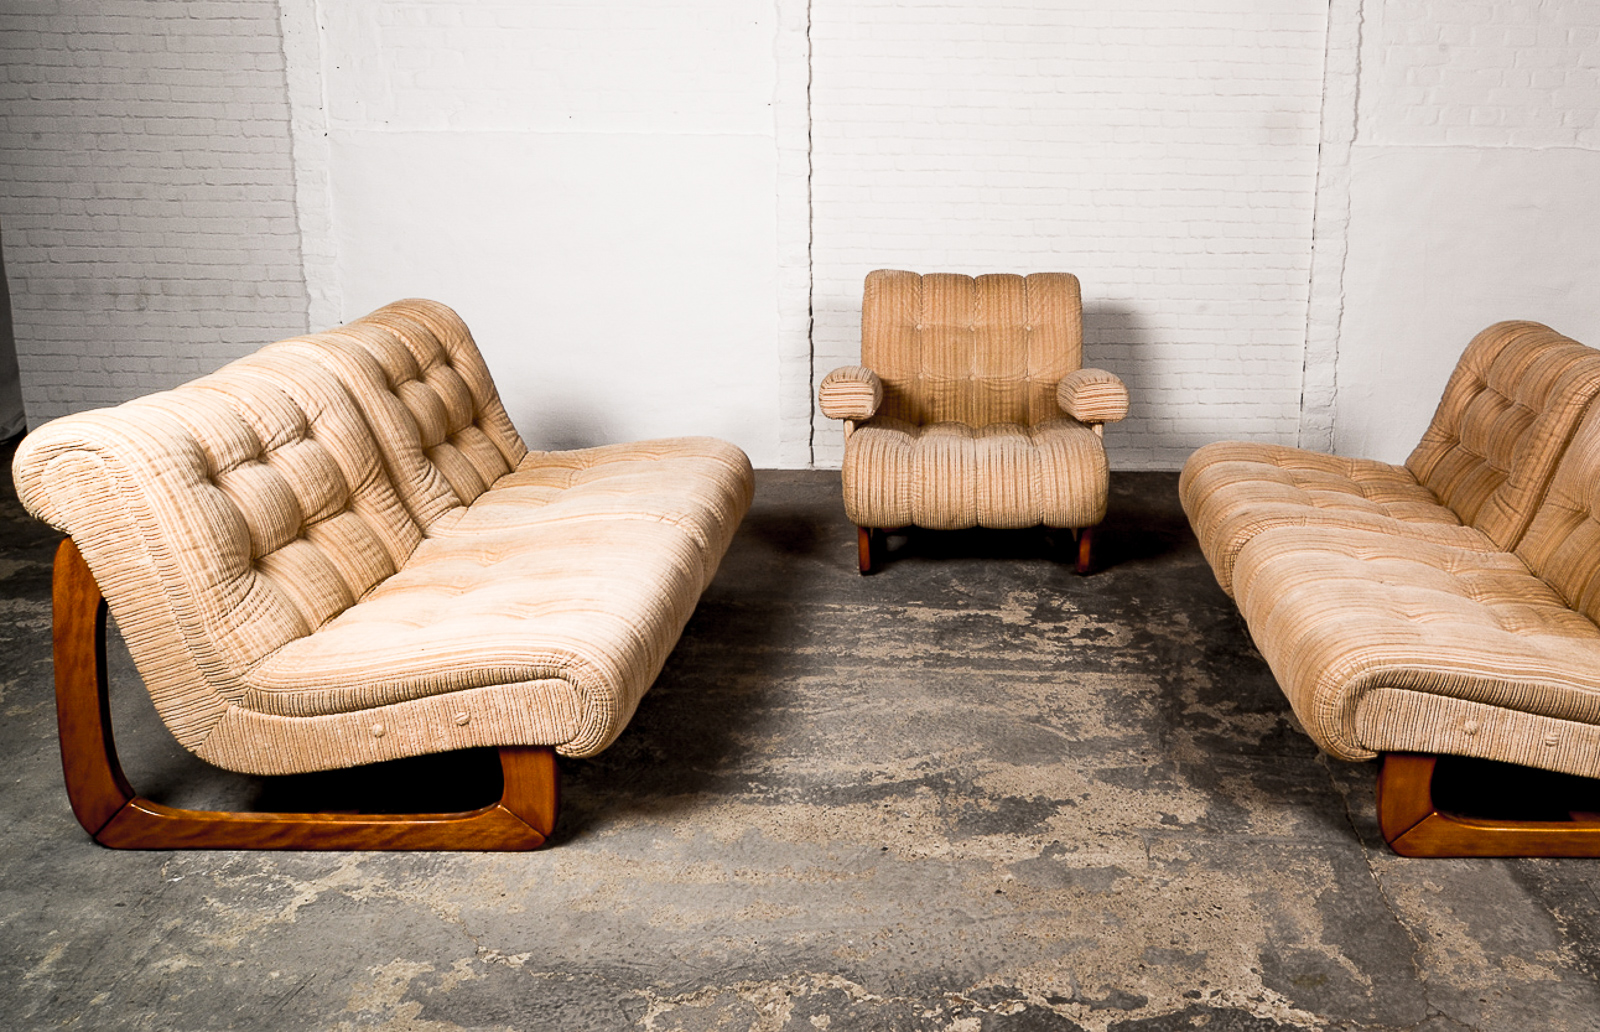 Vintage Design Caramel Corduroy Scandinavian Sofaset And Lounge Chair